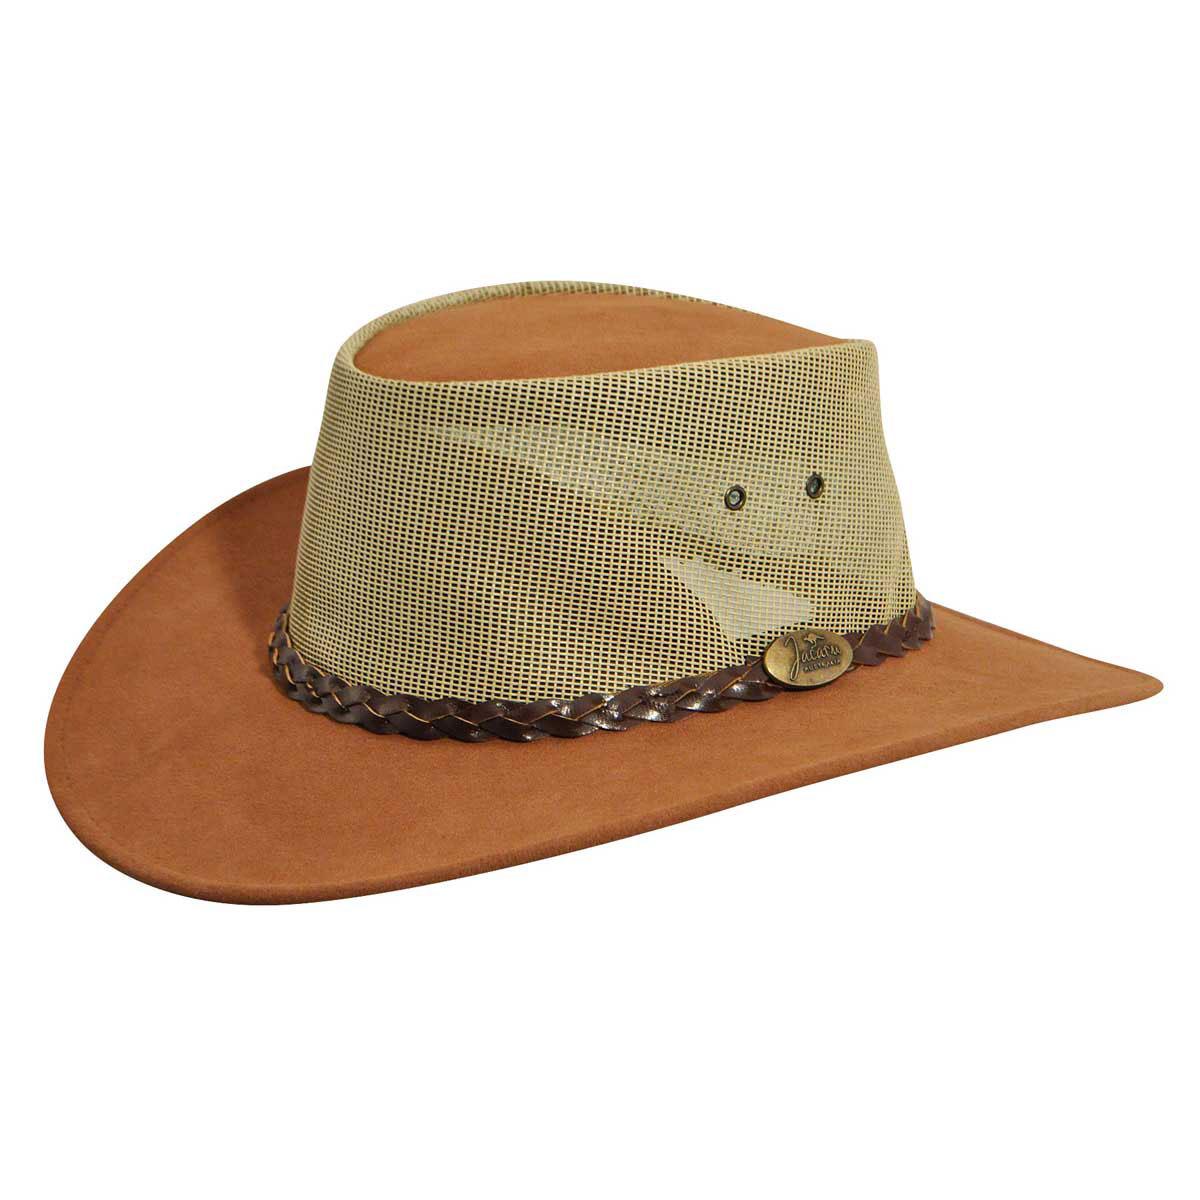 Jacaru Summer Breeze Outback Hat in Mushroom